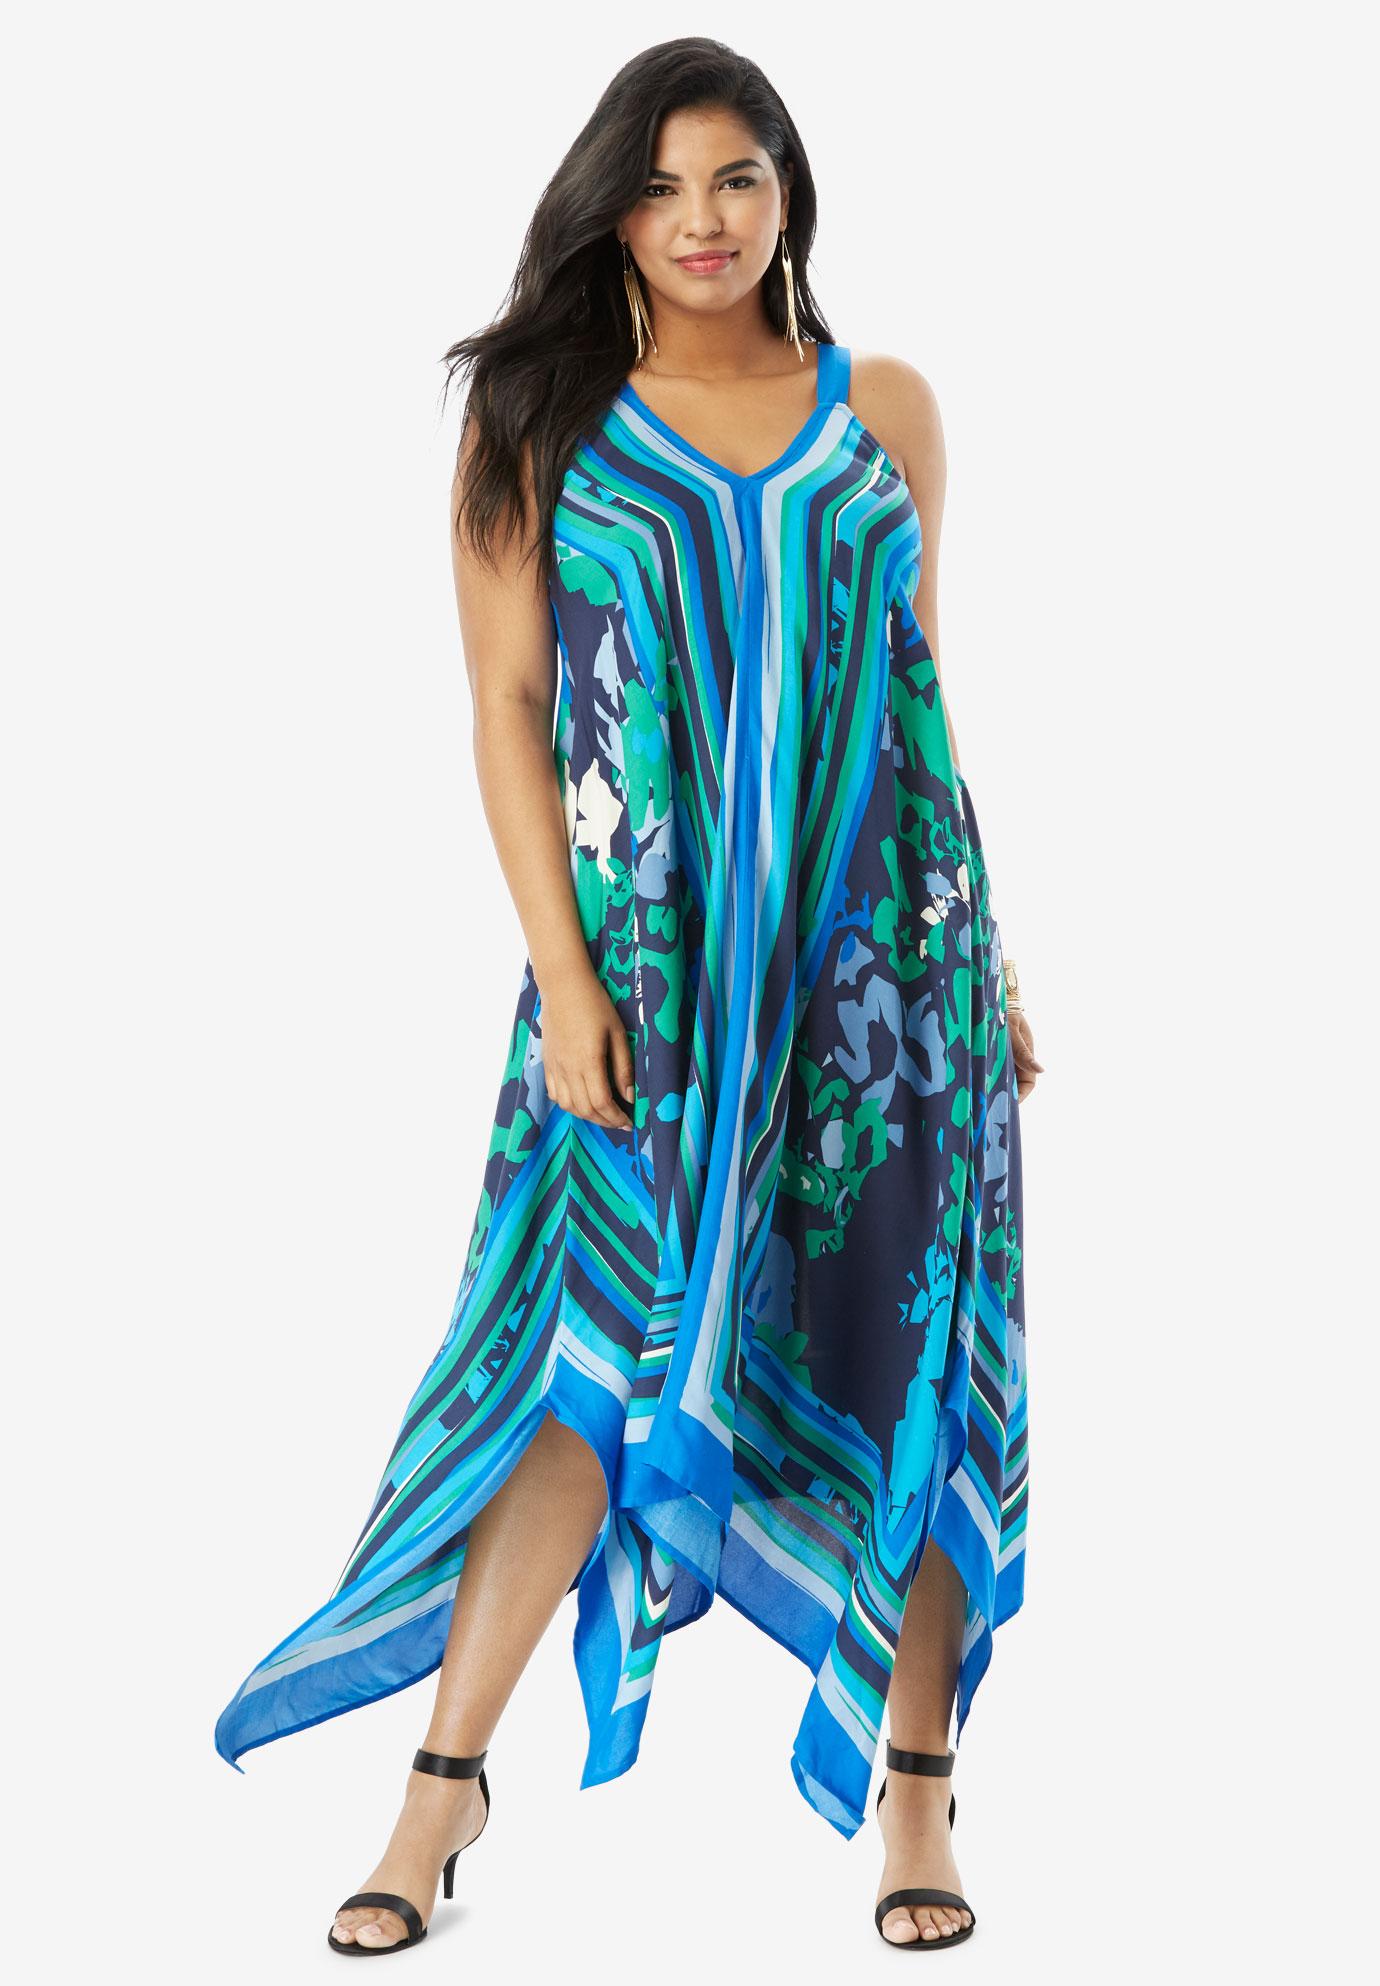 b49ddceab1 Scarf-Print Maxi Dress with Handkerchief Hem